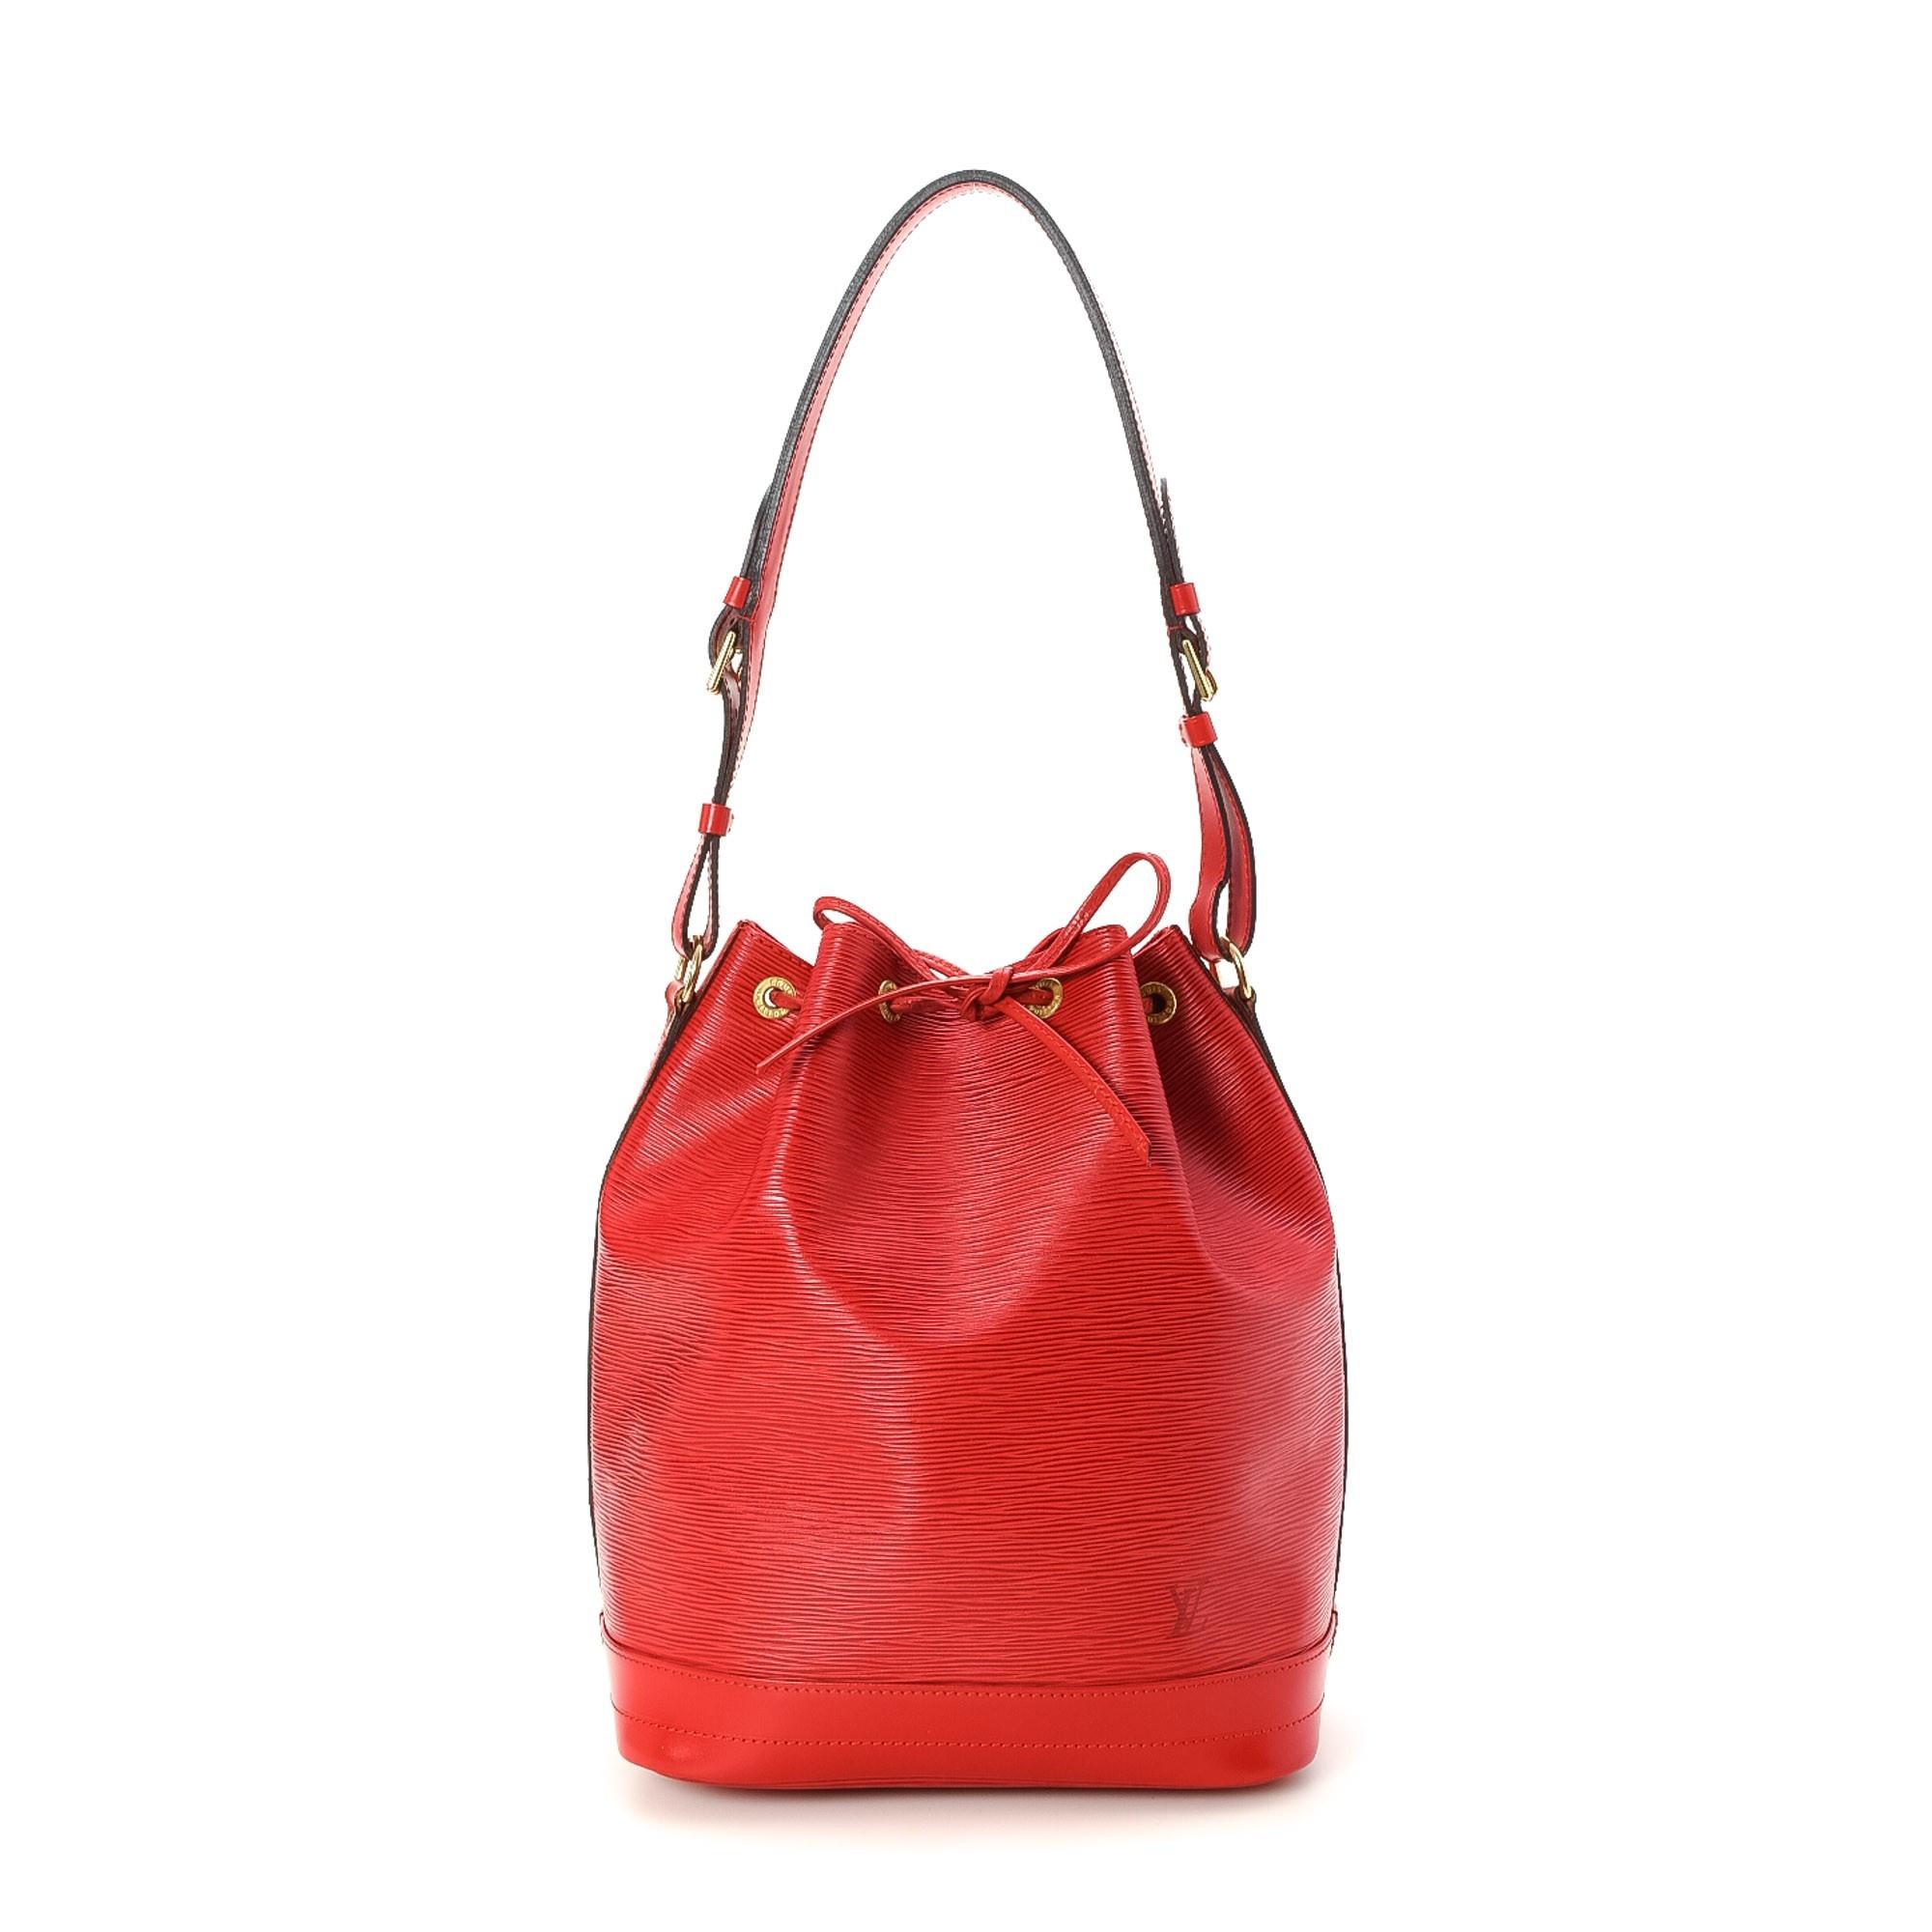 Louis Vuitton Noe Epi Red Leather Shoulder Bag LXRCO